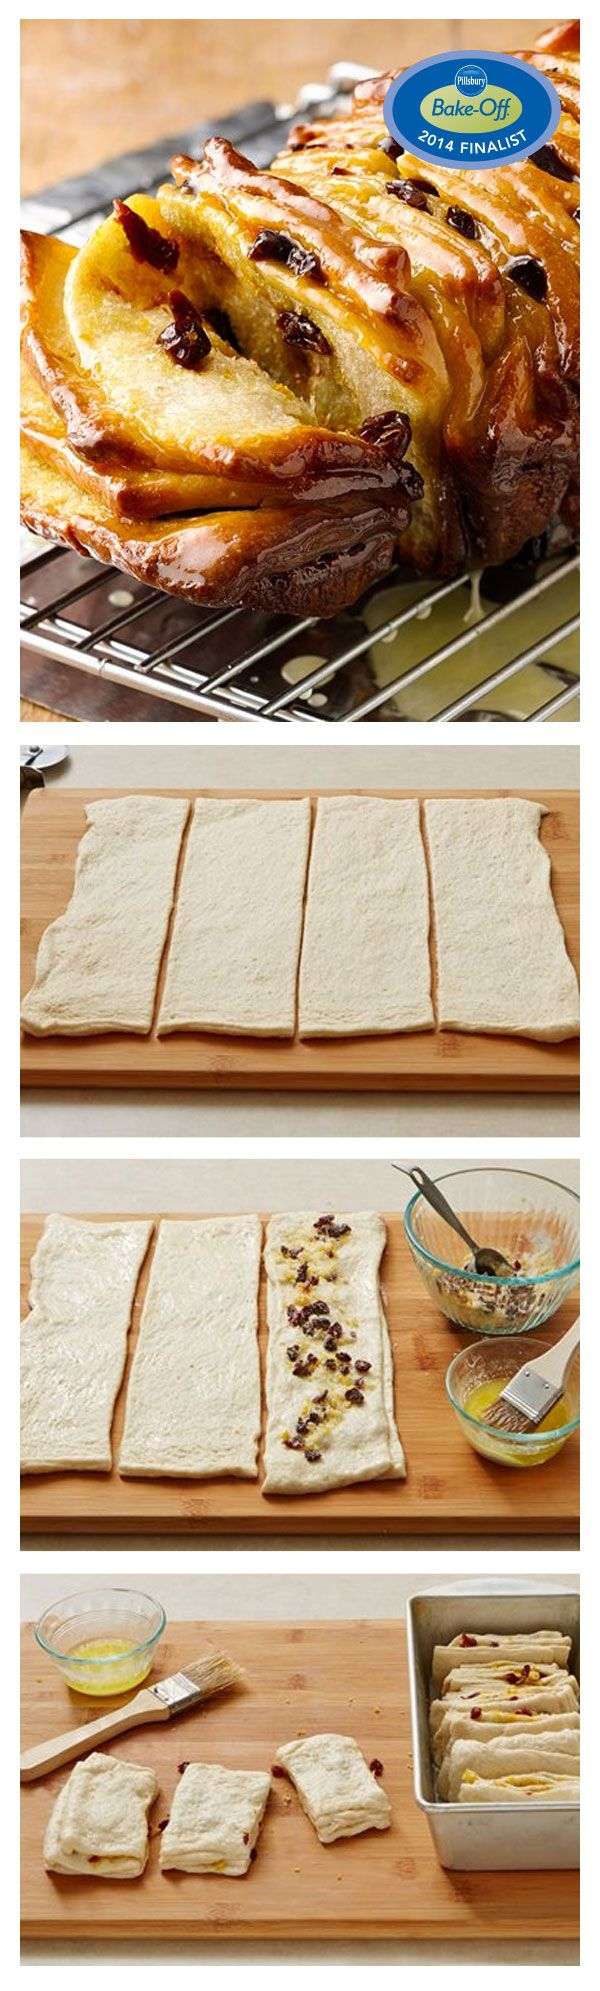 47th Bake-Off Contest Finalist: Cherry-Orange Pull-Apart Breakfast Bread by Maria Rokas from San Francisco, CA